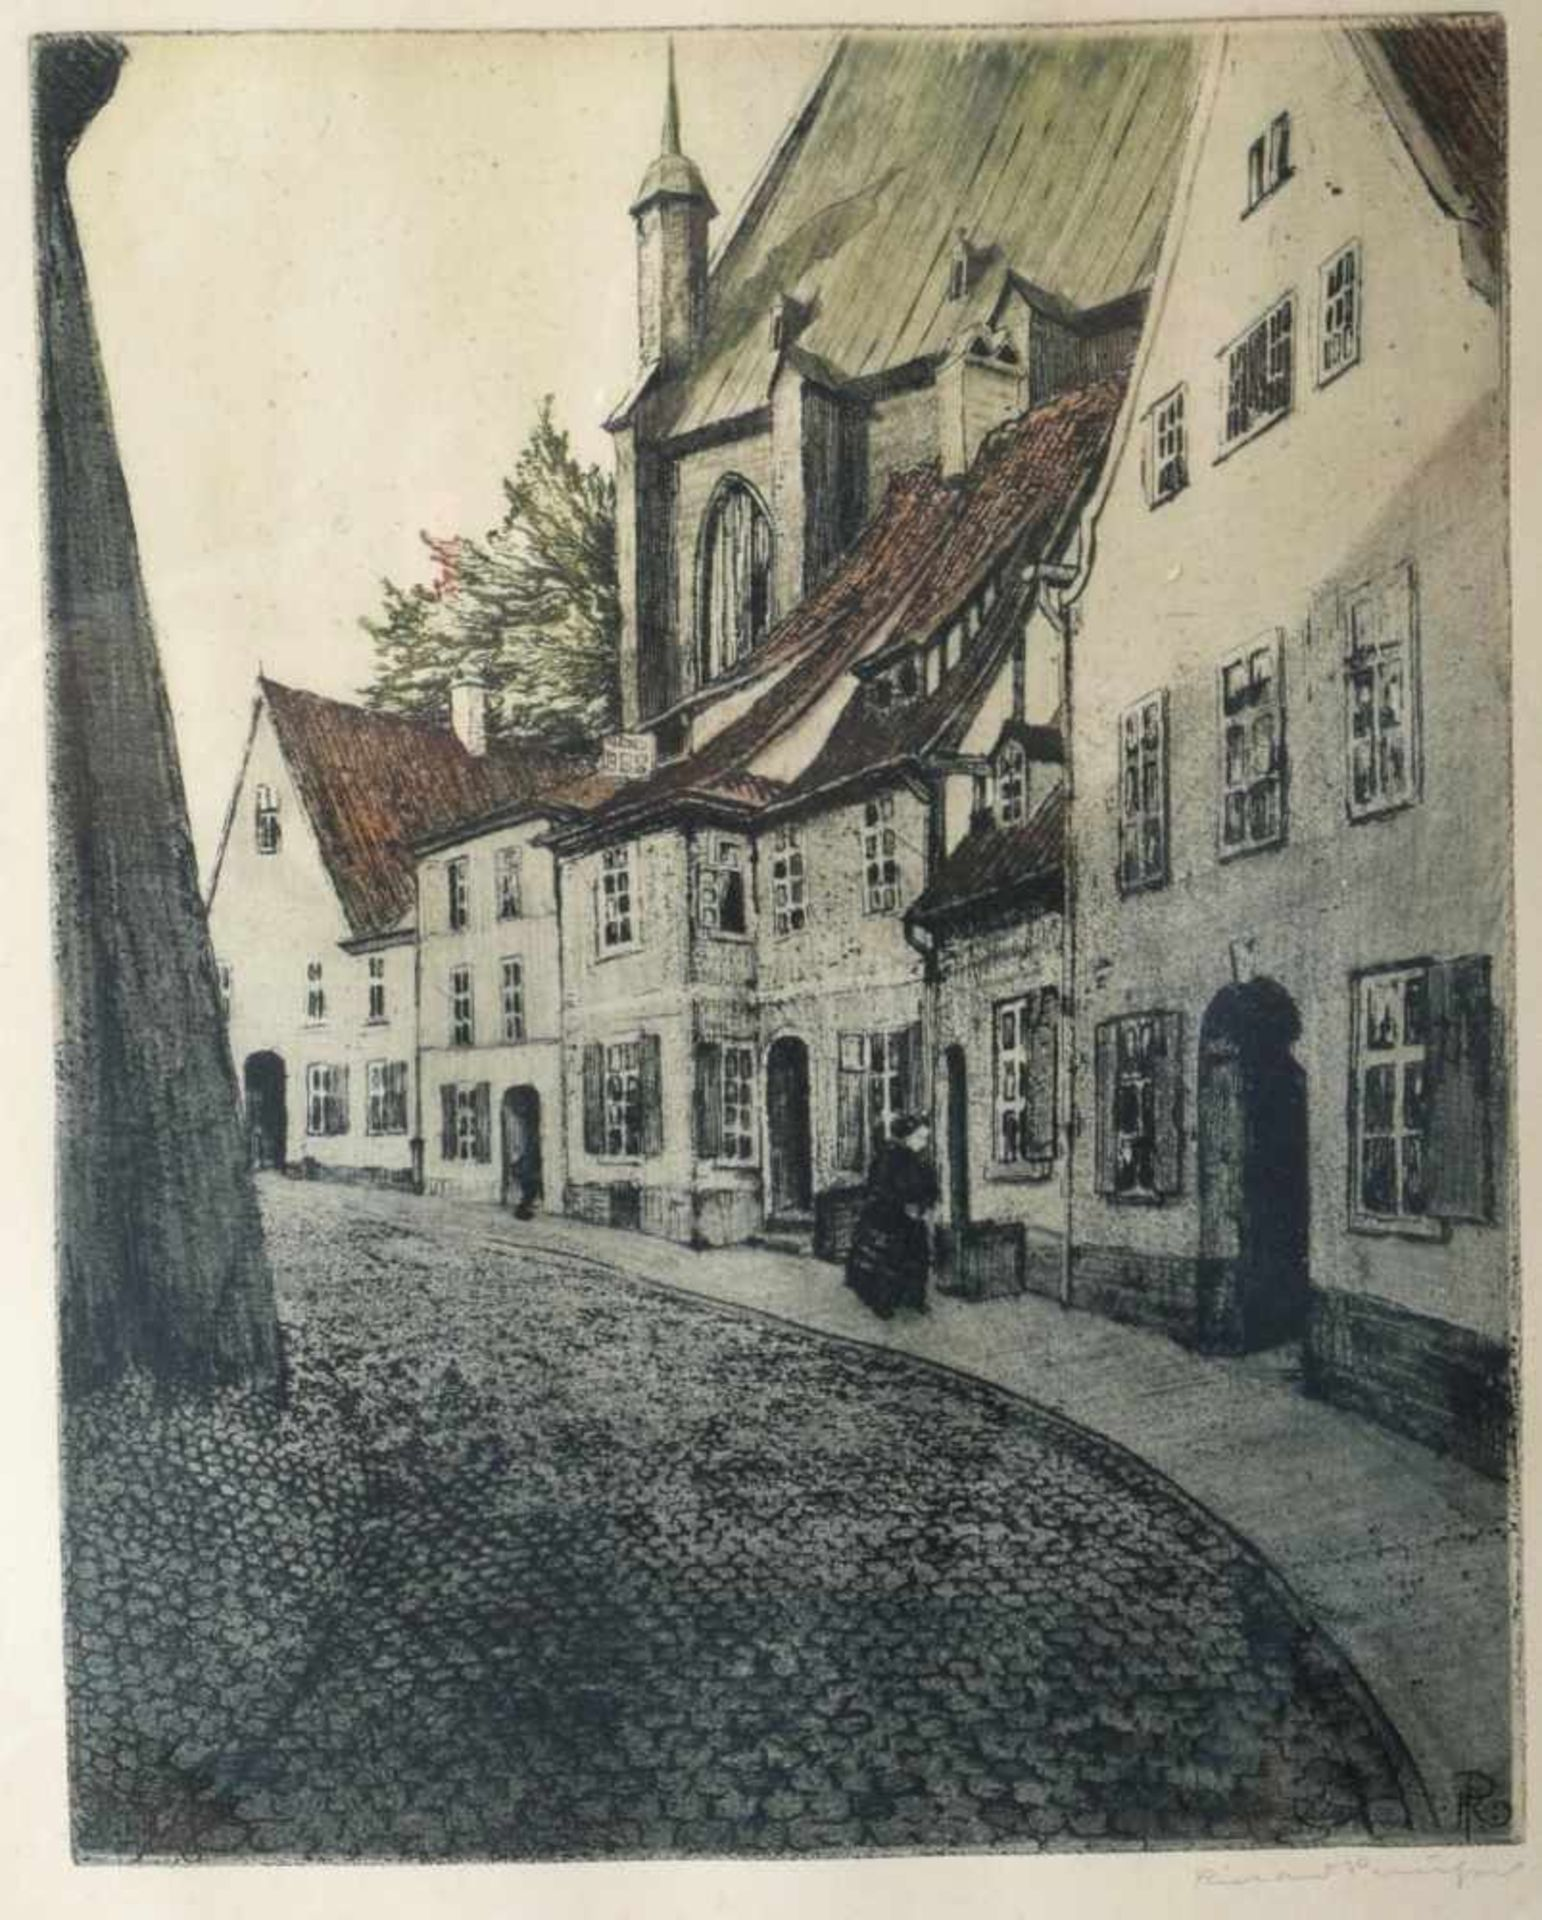 Los 13 - Rabl, Wolfgang (1943) - Farbradierung Dame in Rot Epreuve d´Artiste 1969Ausbalanciert komponierte